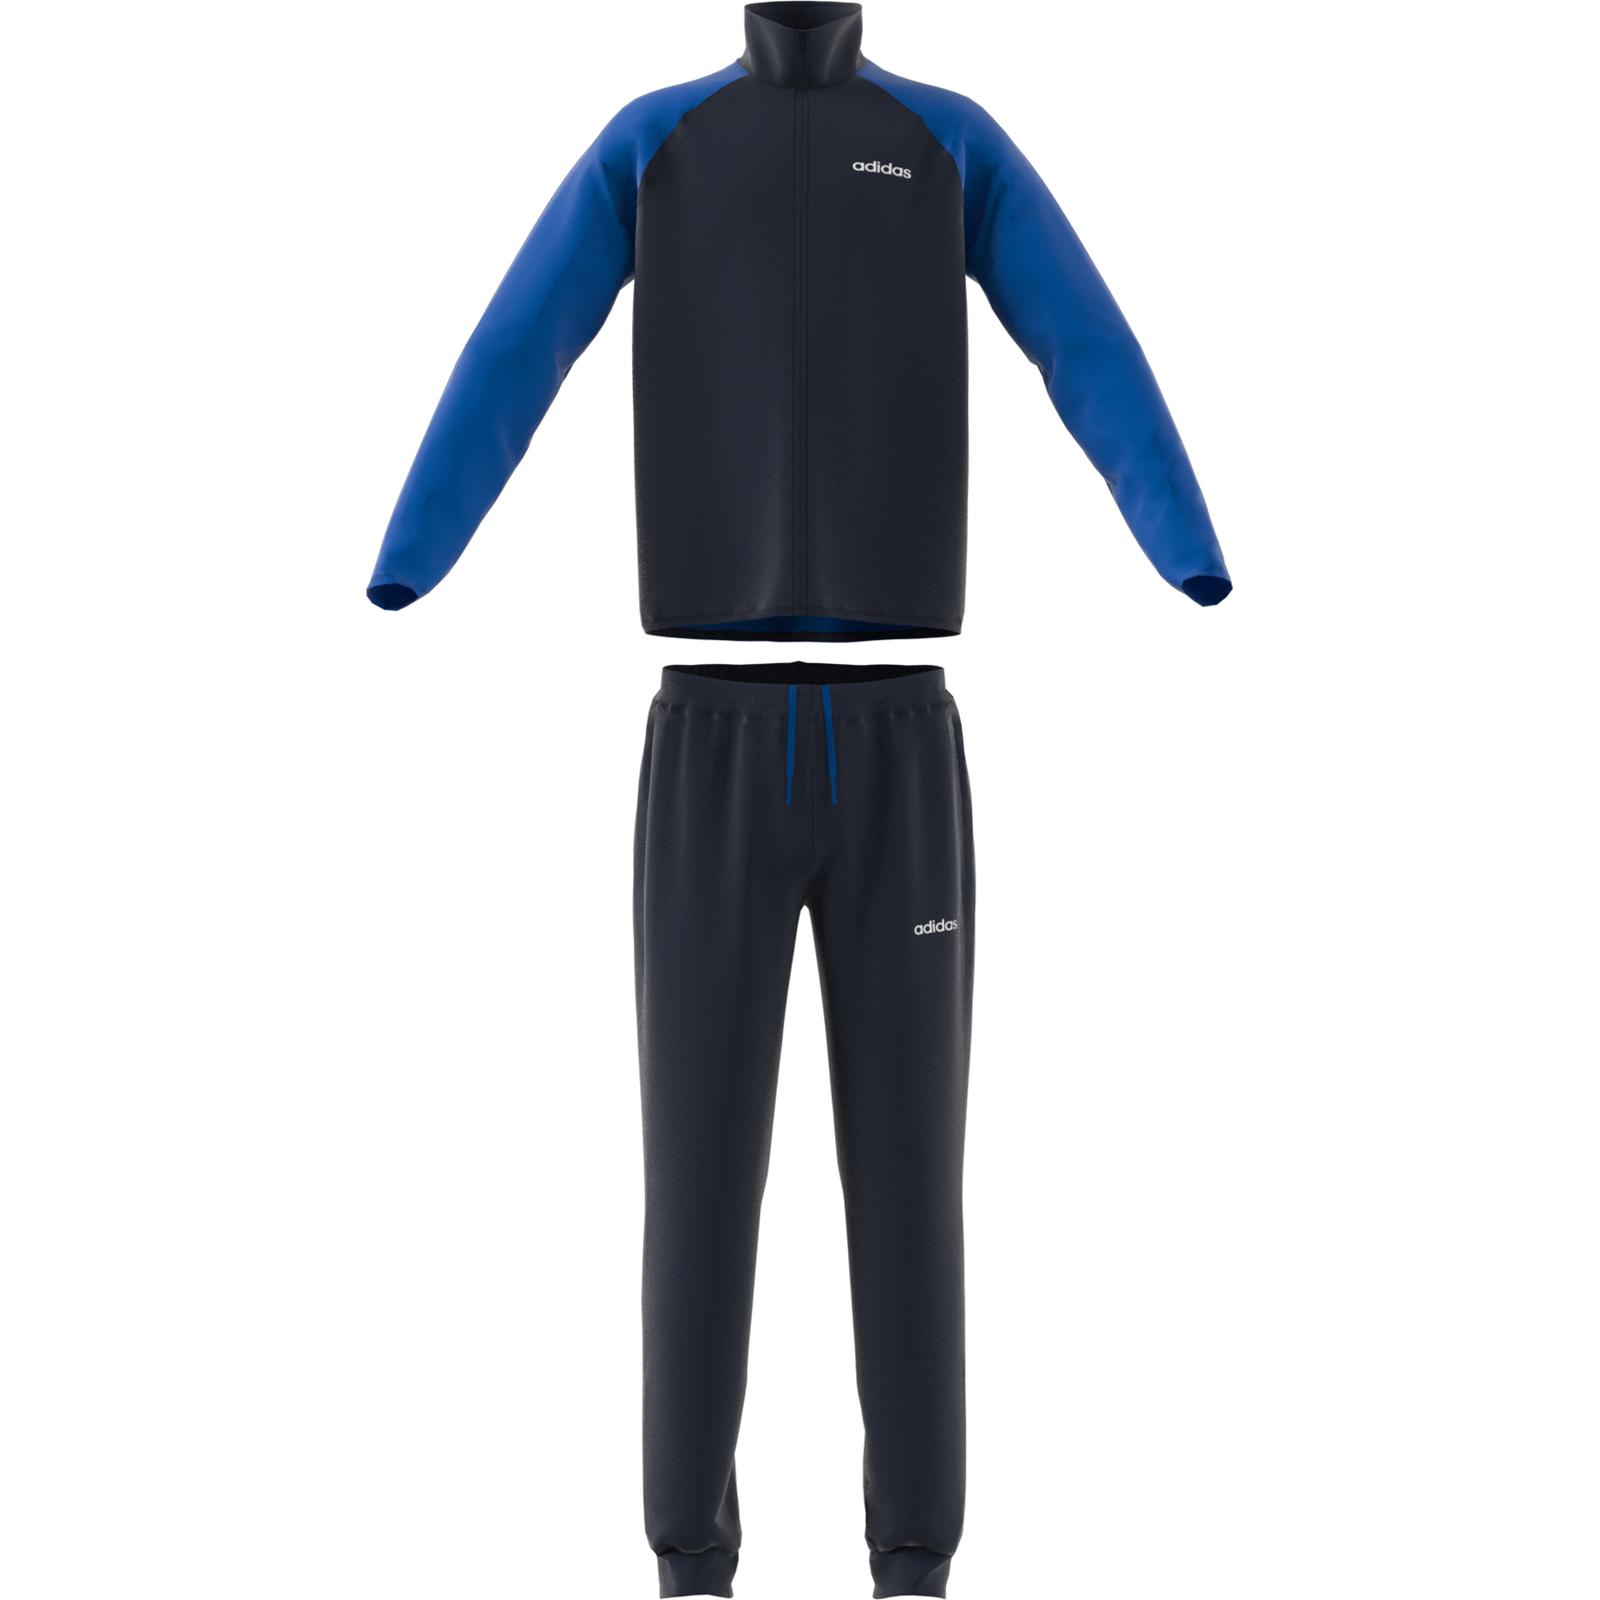 Details zu adidas Performance Kinder Trainingsanzug Essentials Linear Tracksuit legend ink